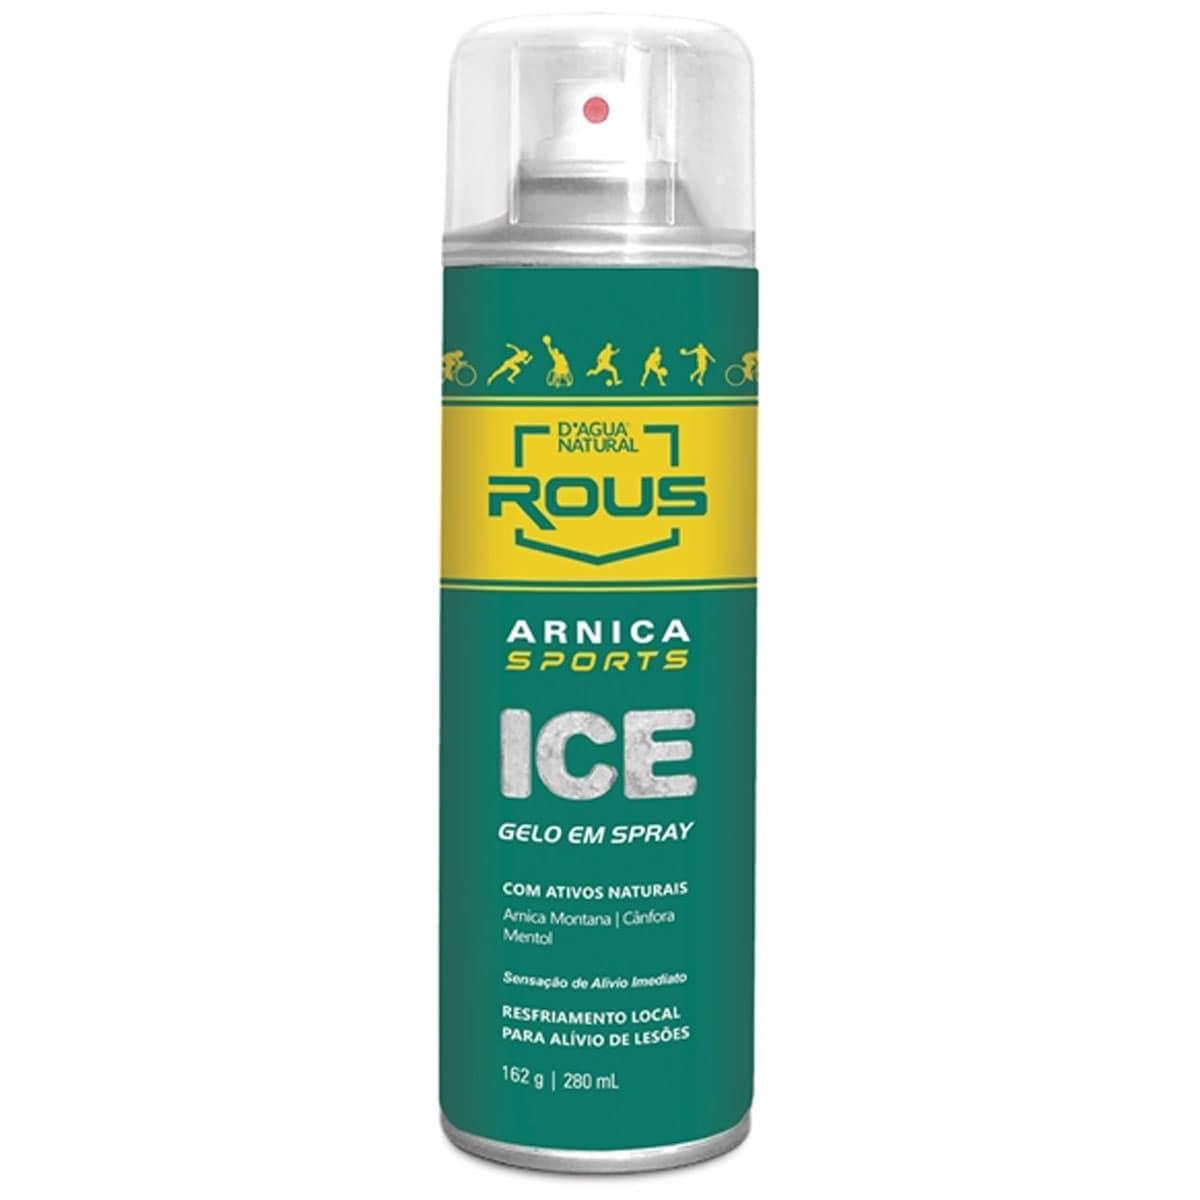 Spray arnica sports ice 280ml - d agua natural